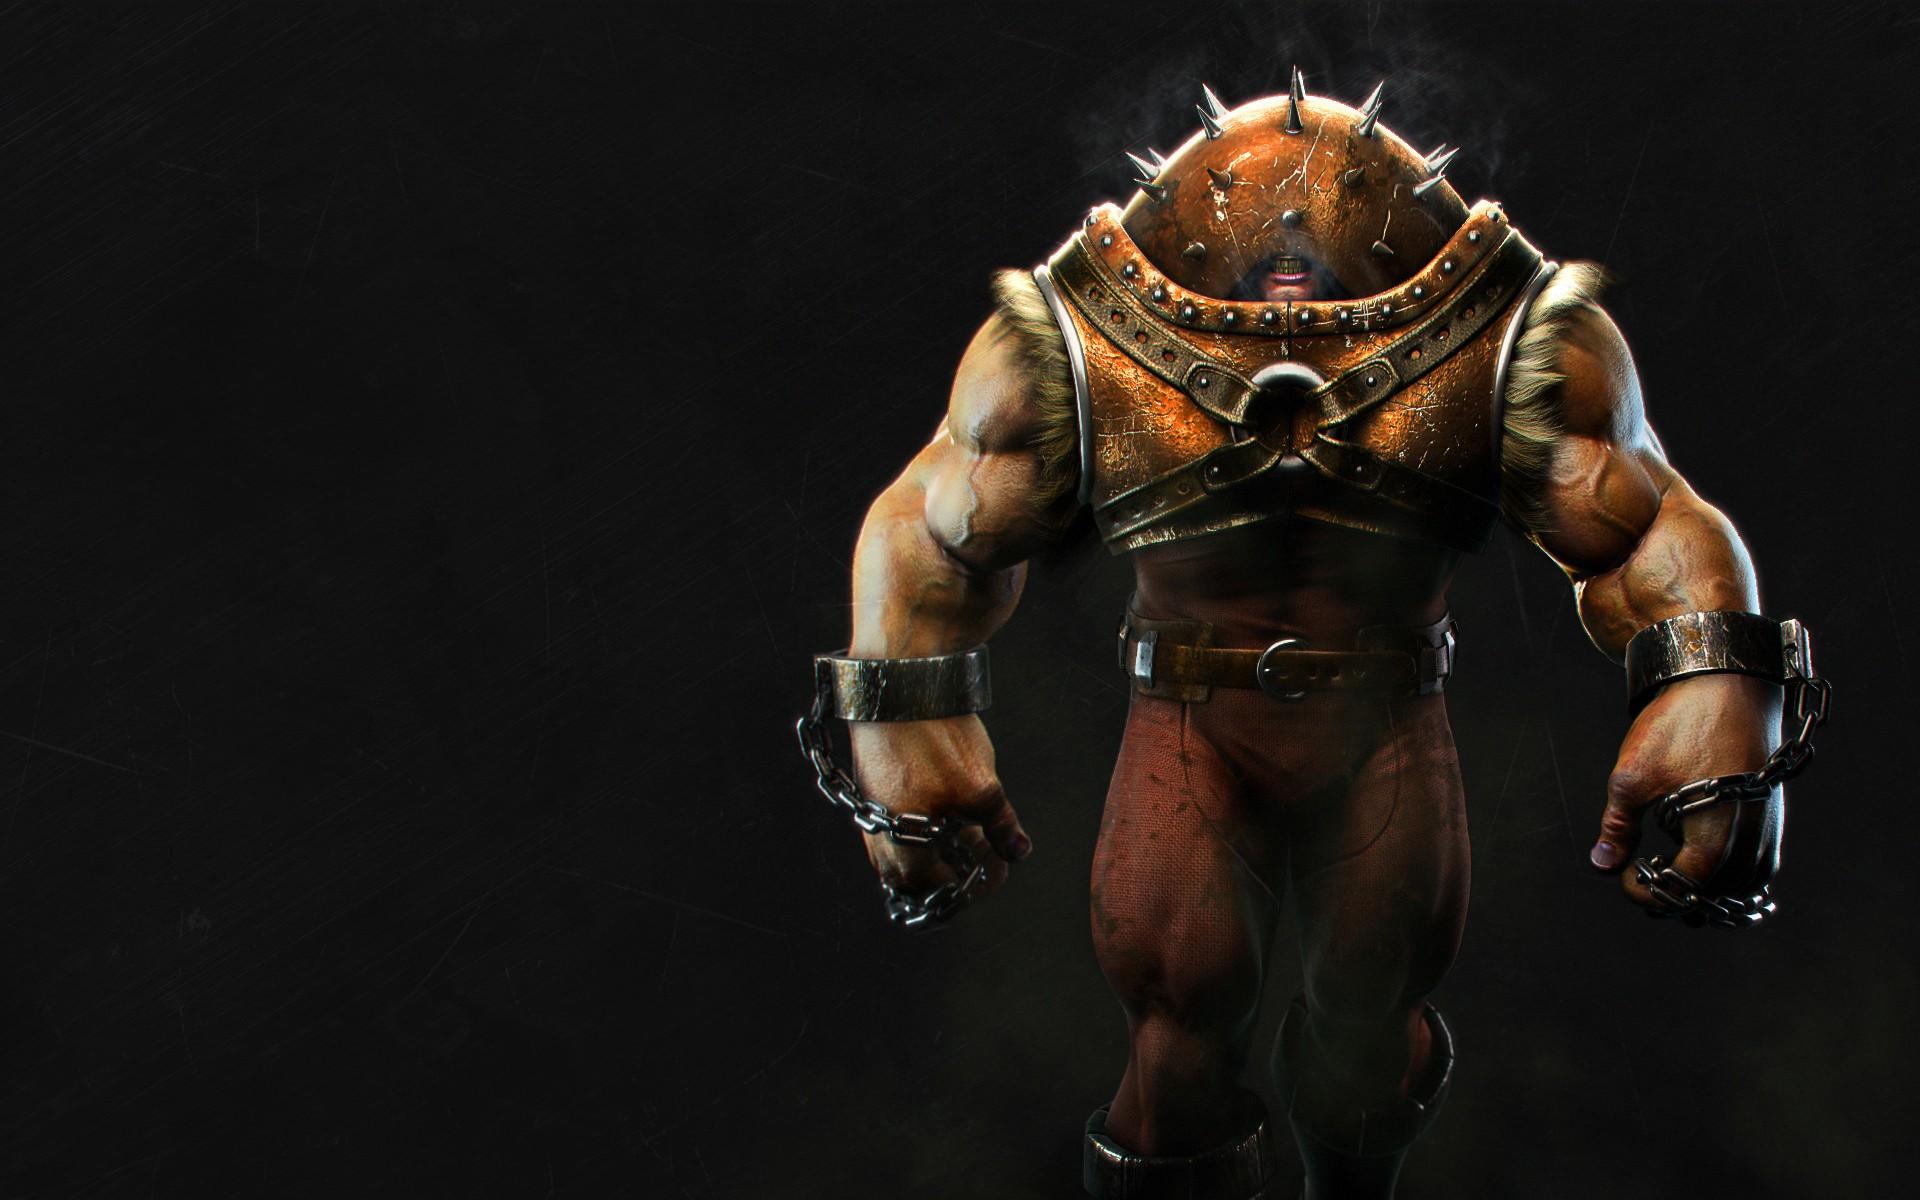 Juggernaut Marvel x-men wallpaper backgroundX Men Juggernaut